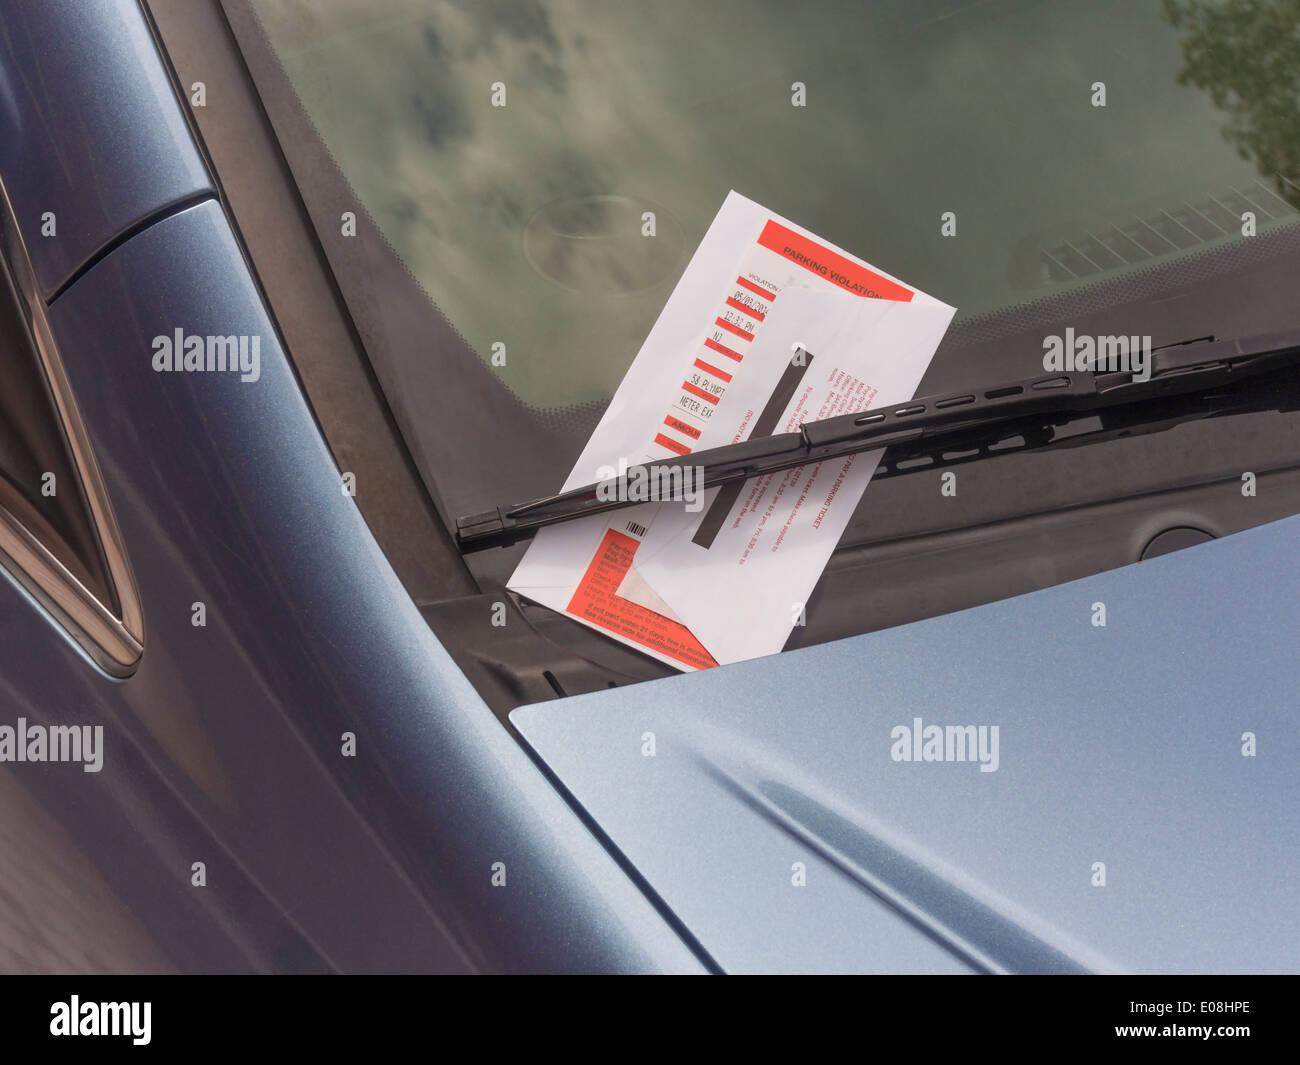 parking ticket on motor car windscreen or windshield. - Stock Image